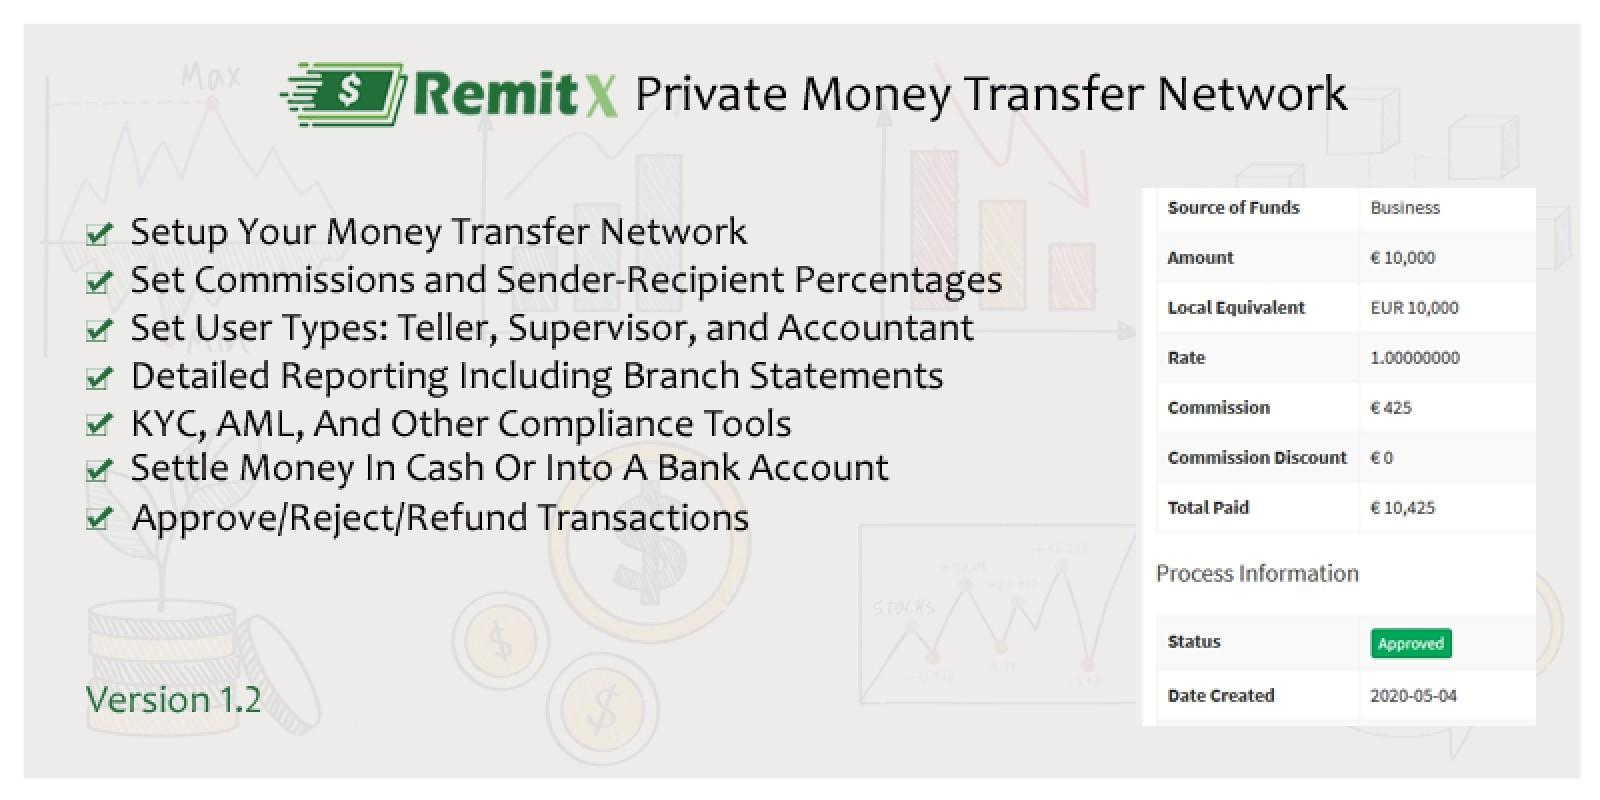 RemitX - Private Money Transfer Network